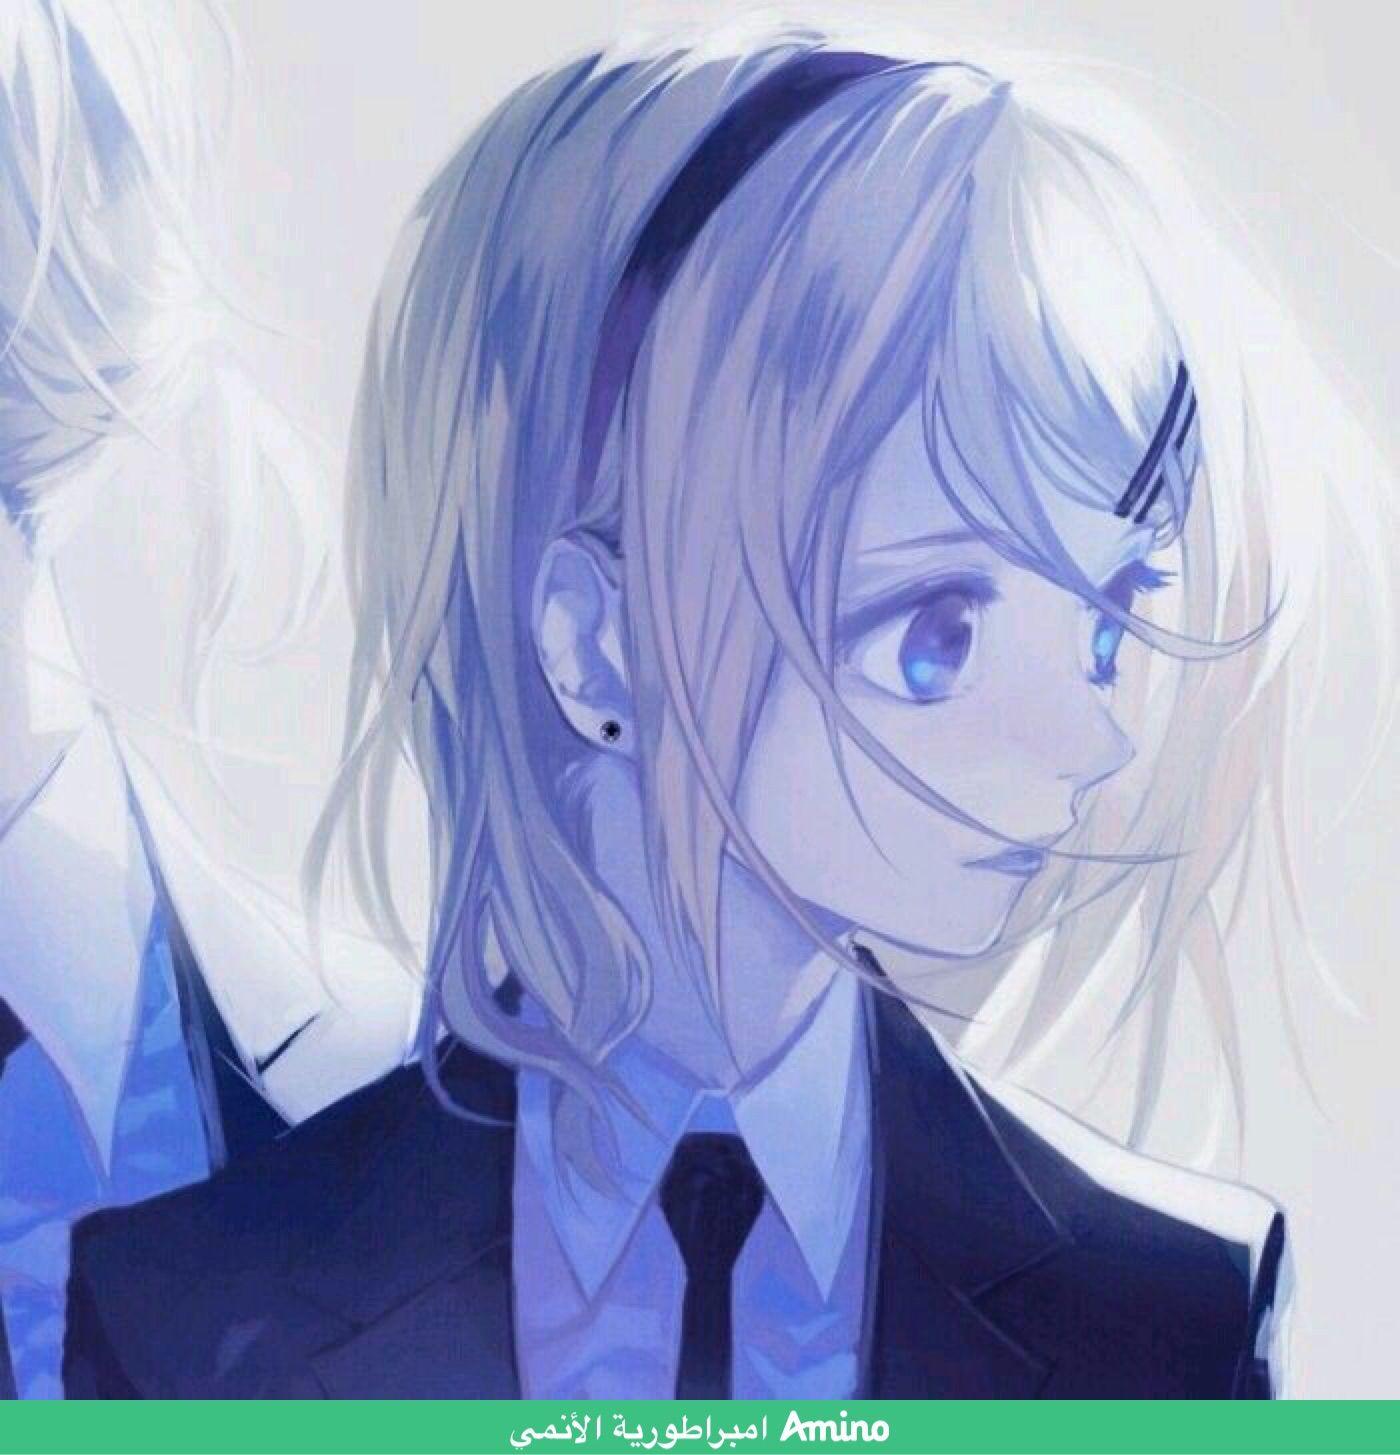 Ꮧ&Ꮇ- ᏒᎧᏦᏗ | امبراطورية الأنمي Amino